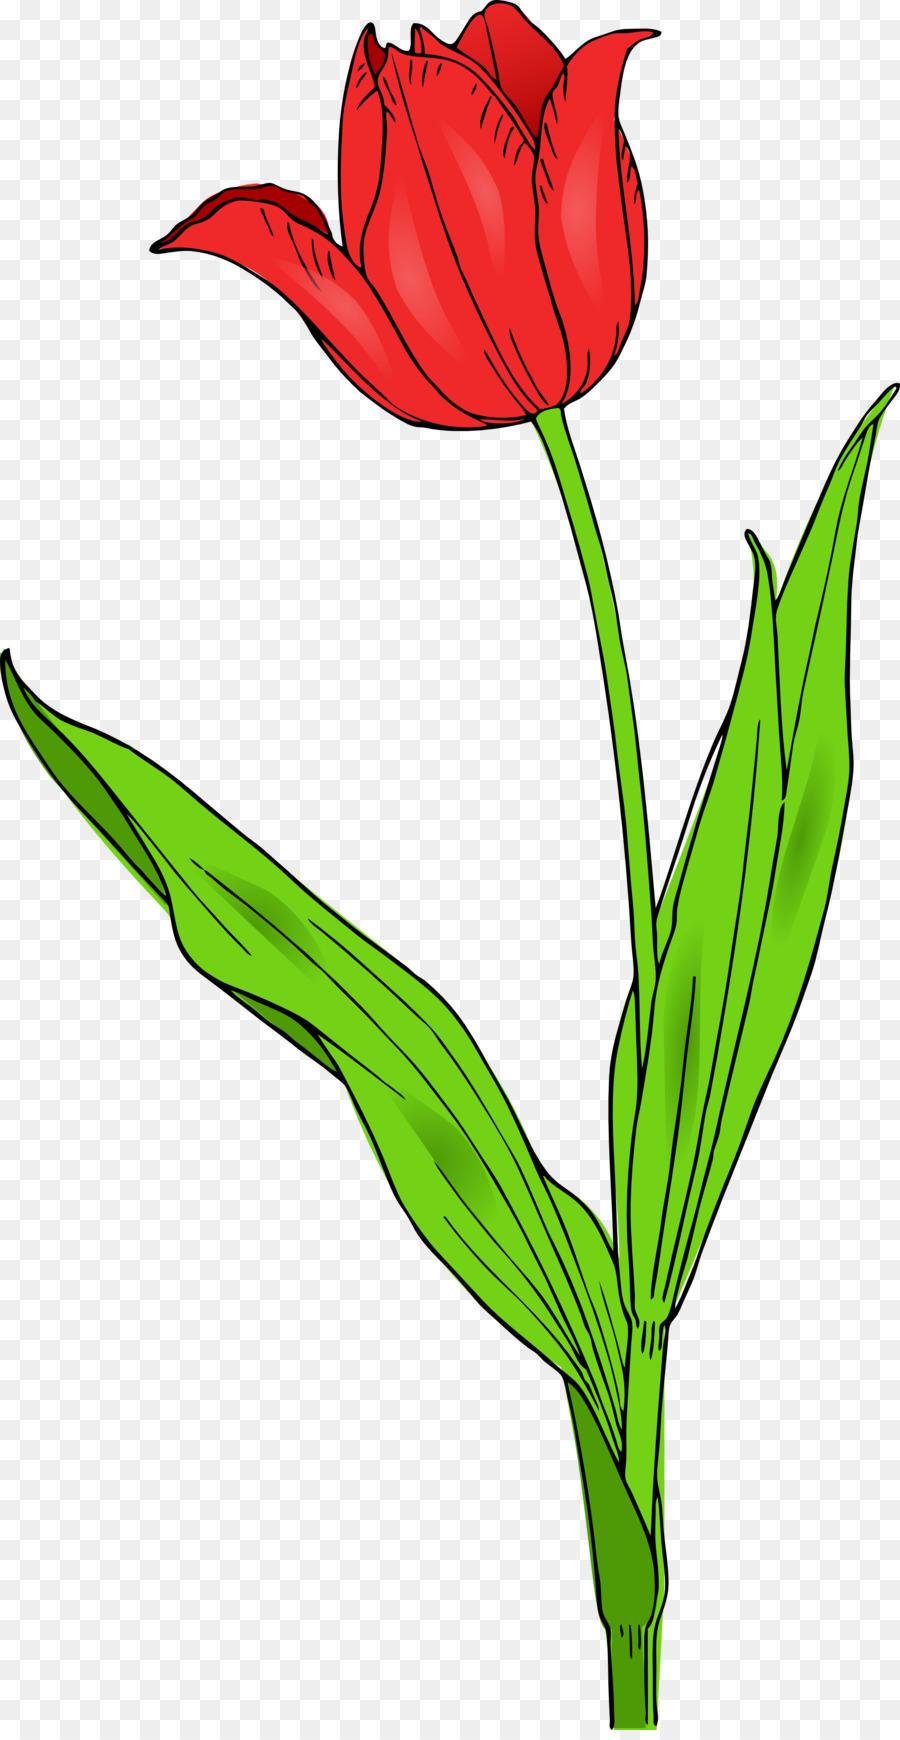 Flower, Plant, Tulip, transparent png image & clipart free download.